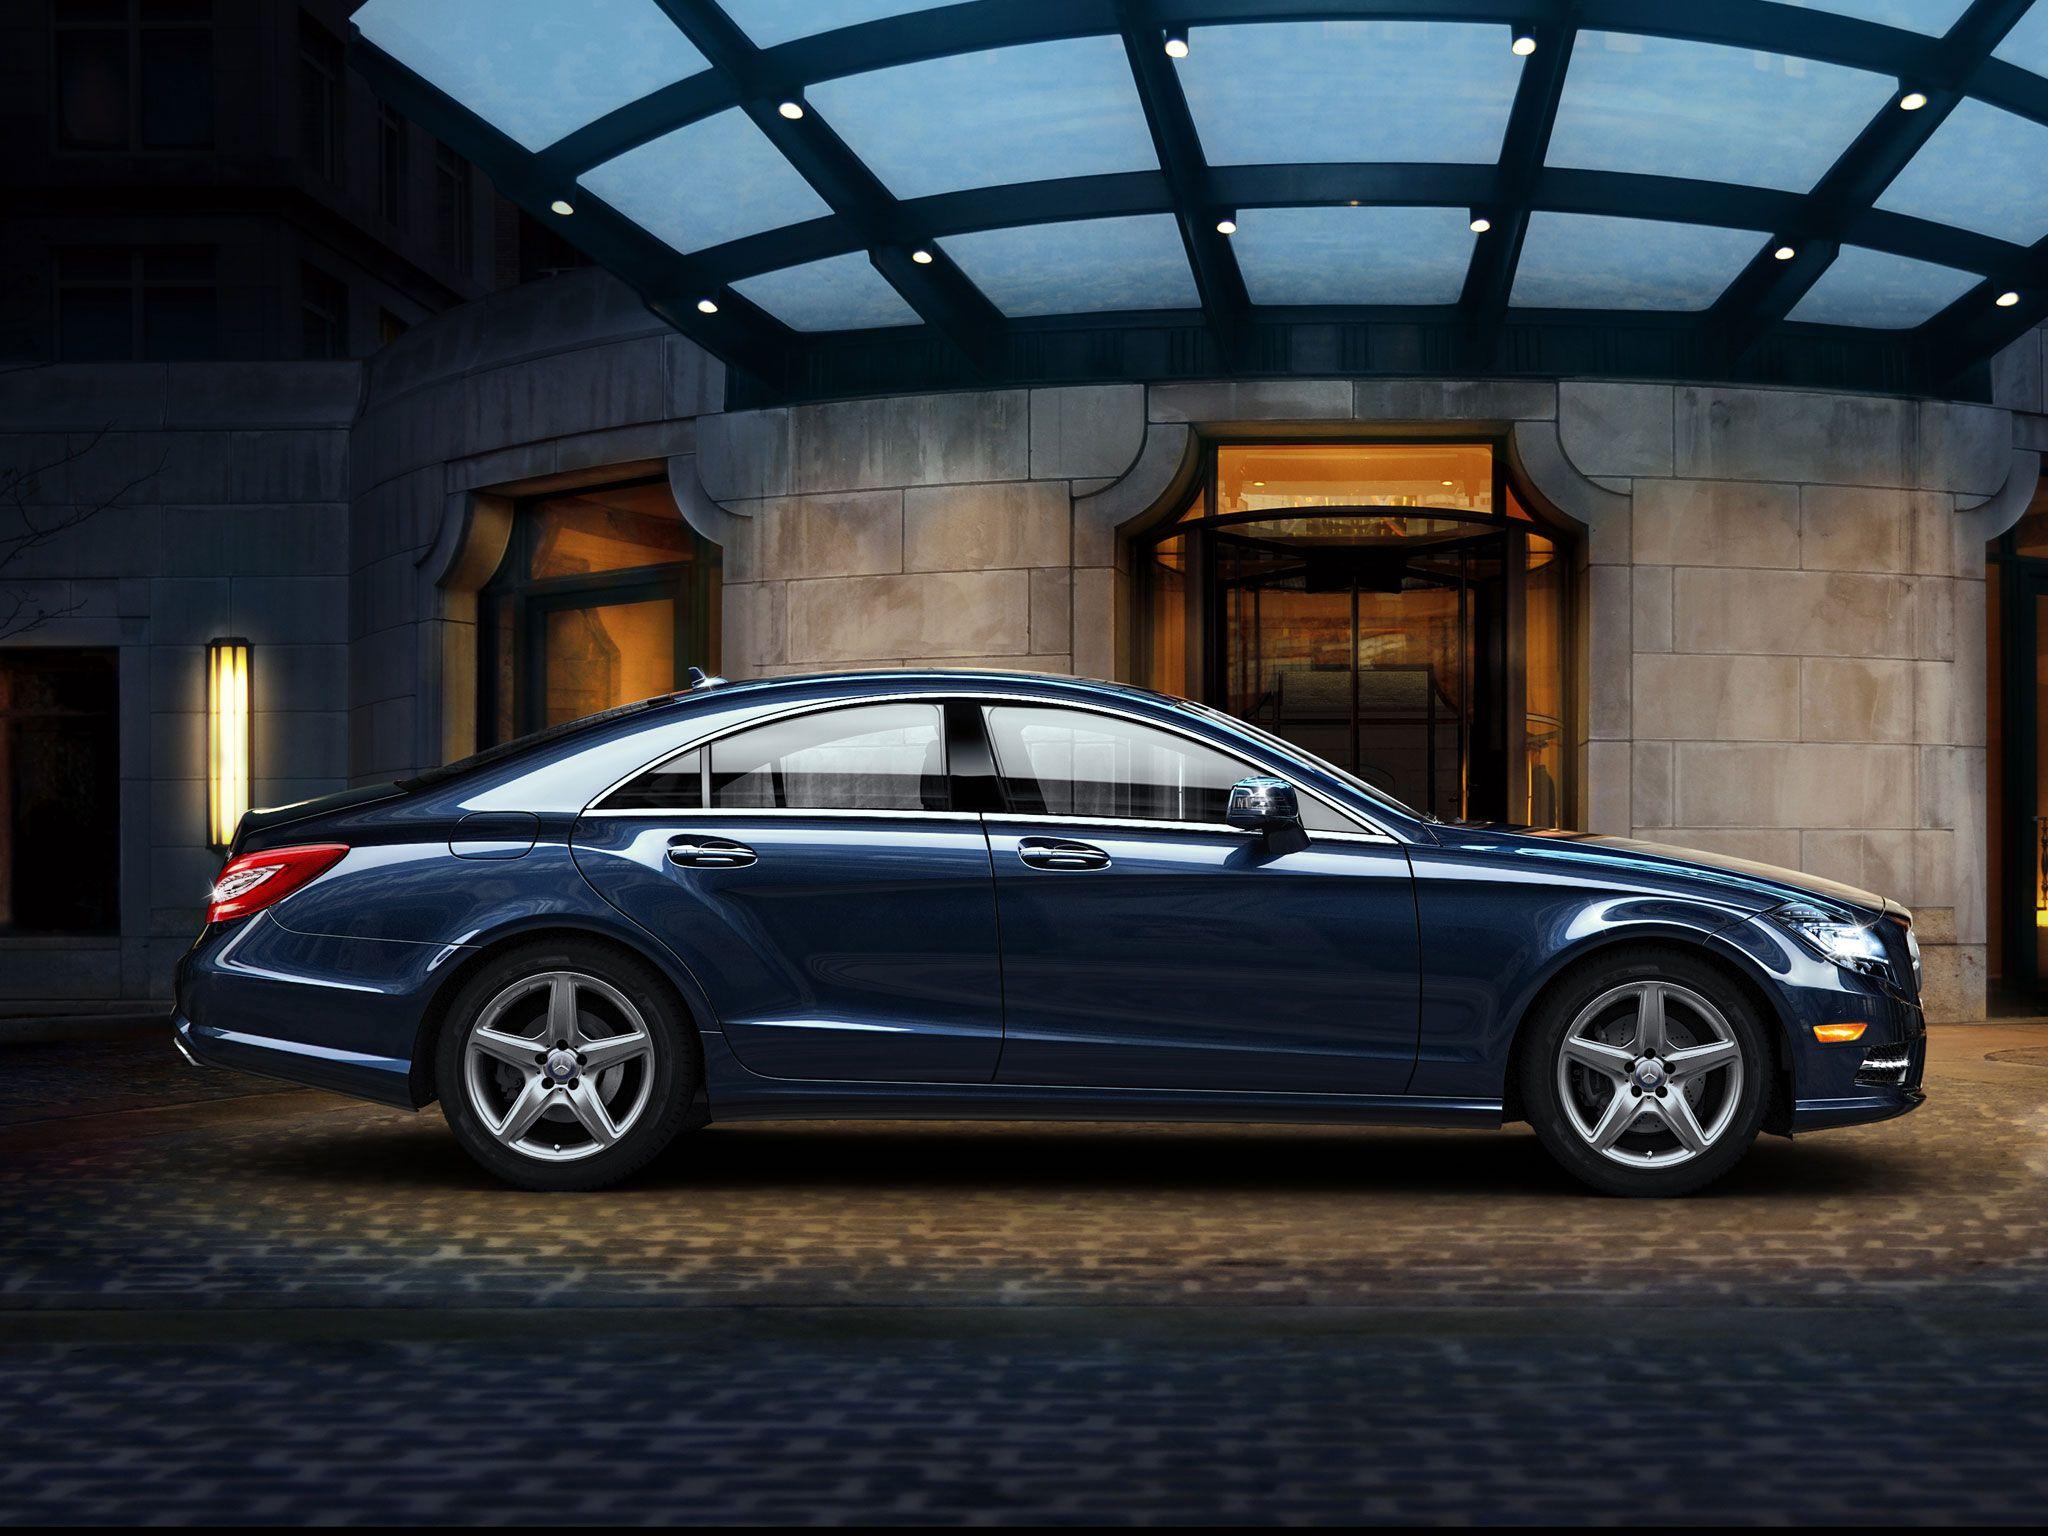 Mercedes benz cls550 in lunar blue metallic with 18 inch amg wheels